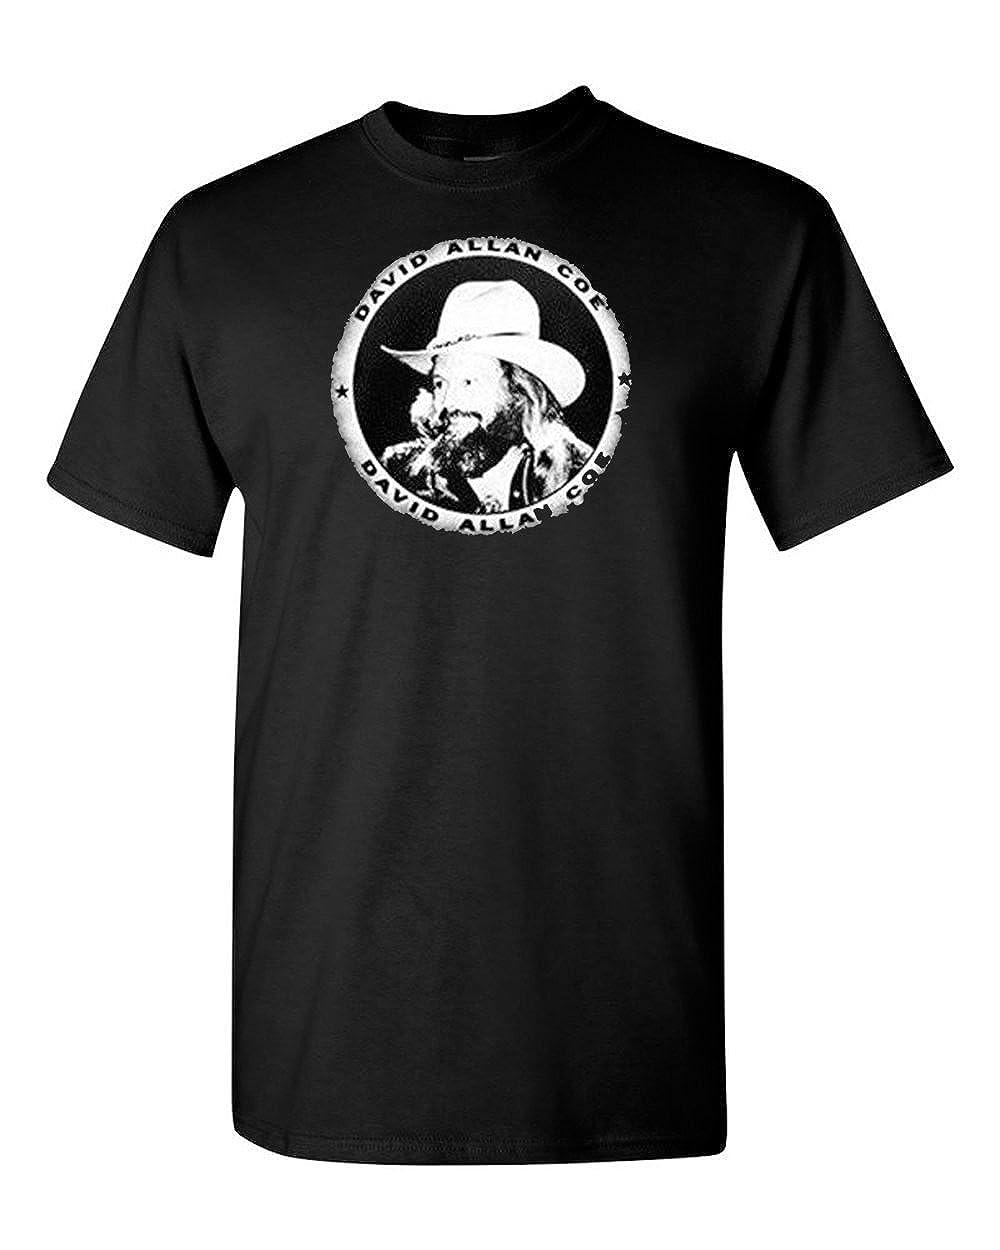 David Allan T Shirts